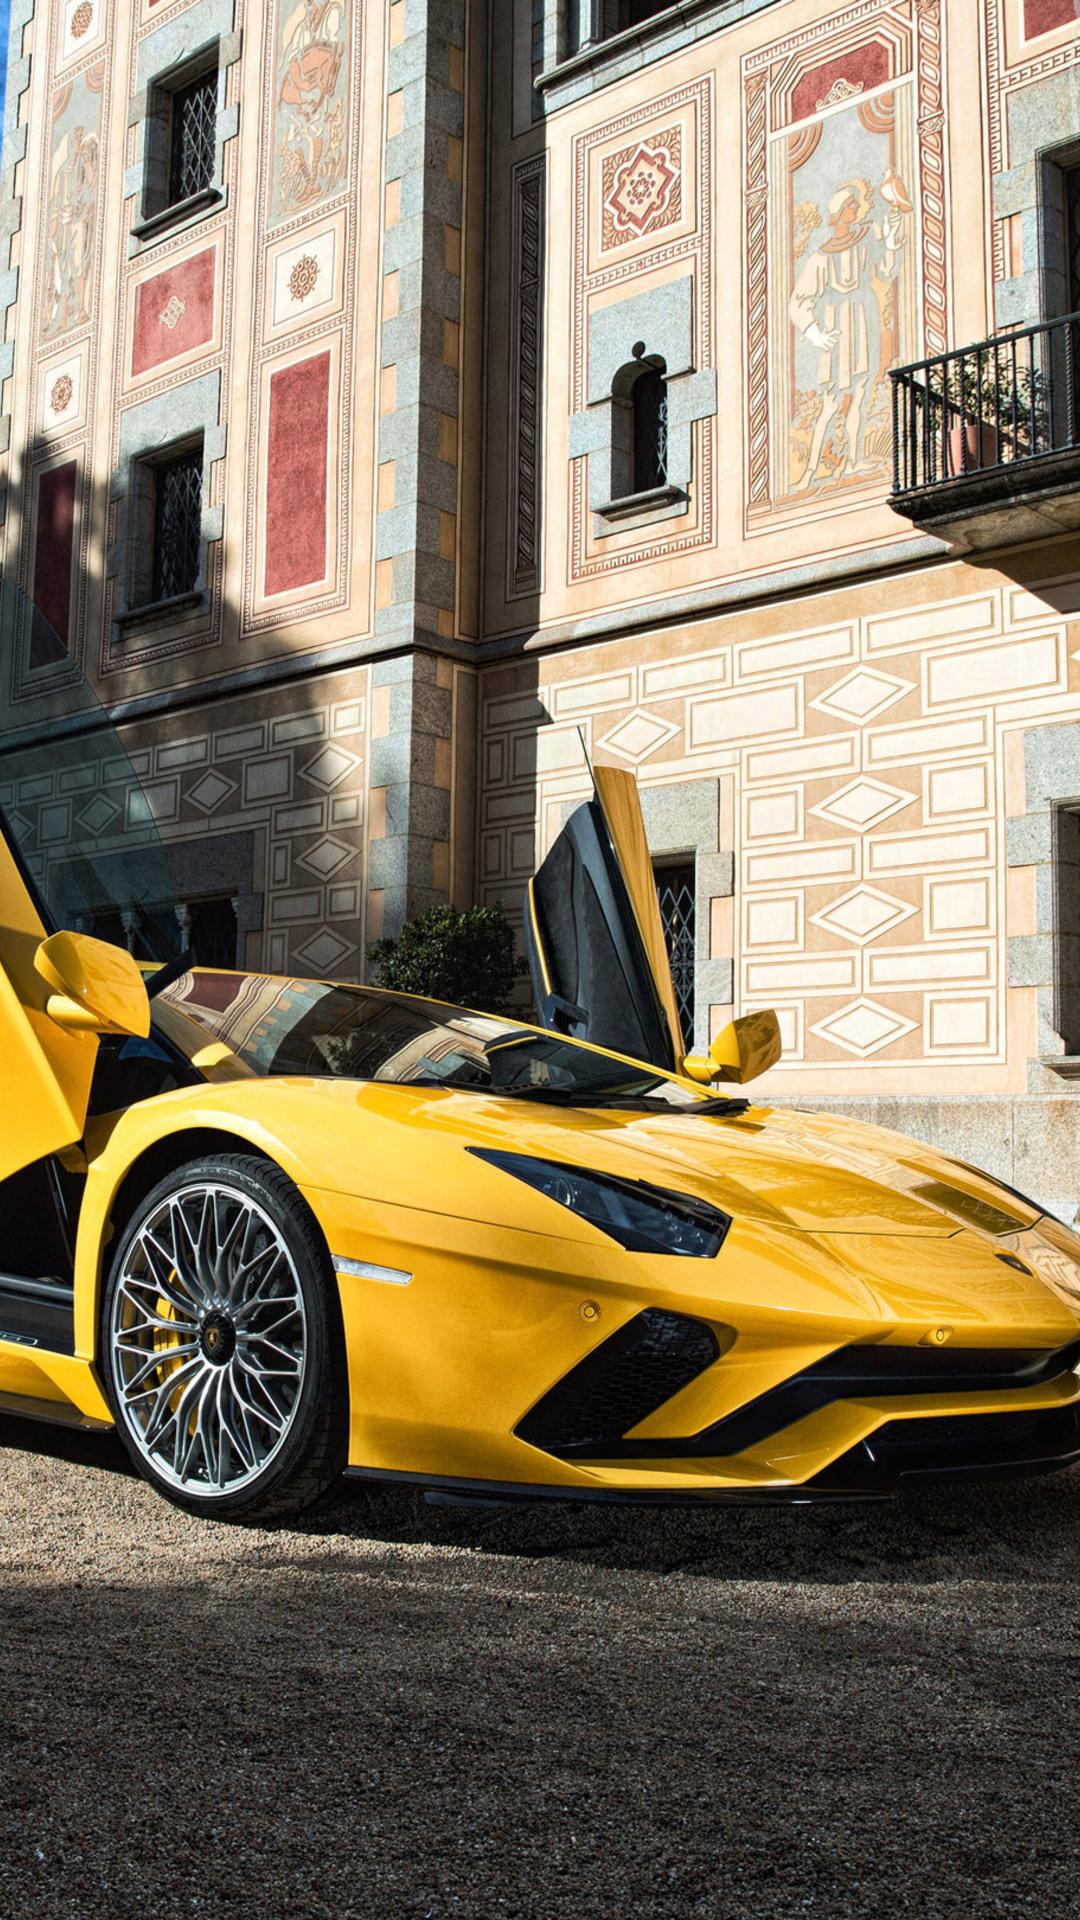 1080x1920 Lamborghini Aventador 5k 4k Iphone 7,6s,6 Plus ...